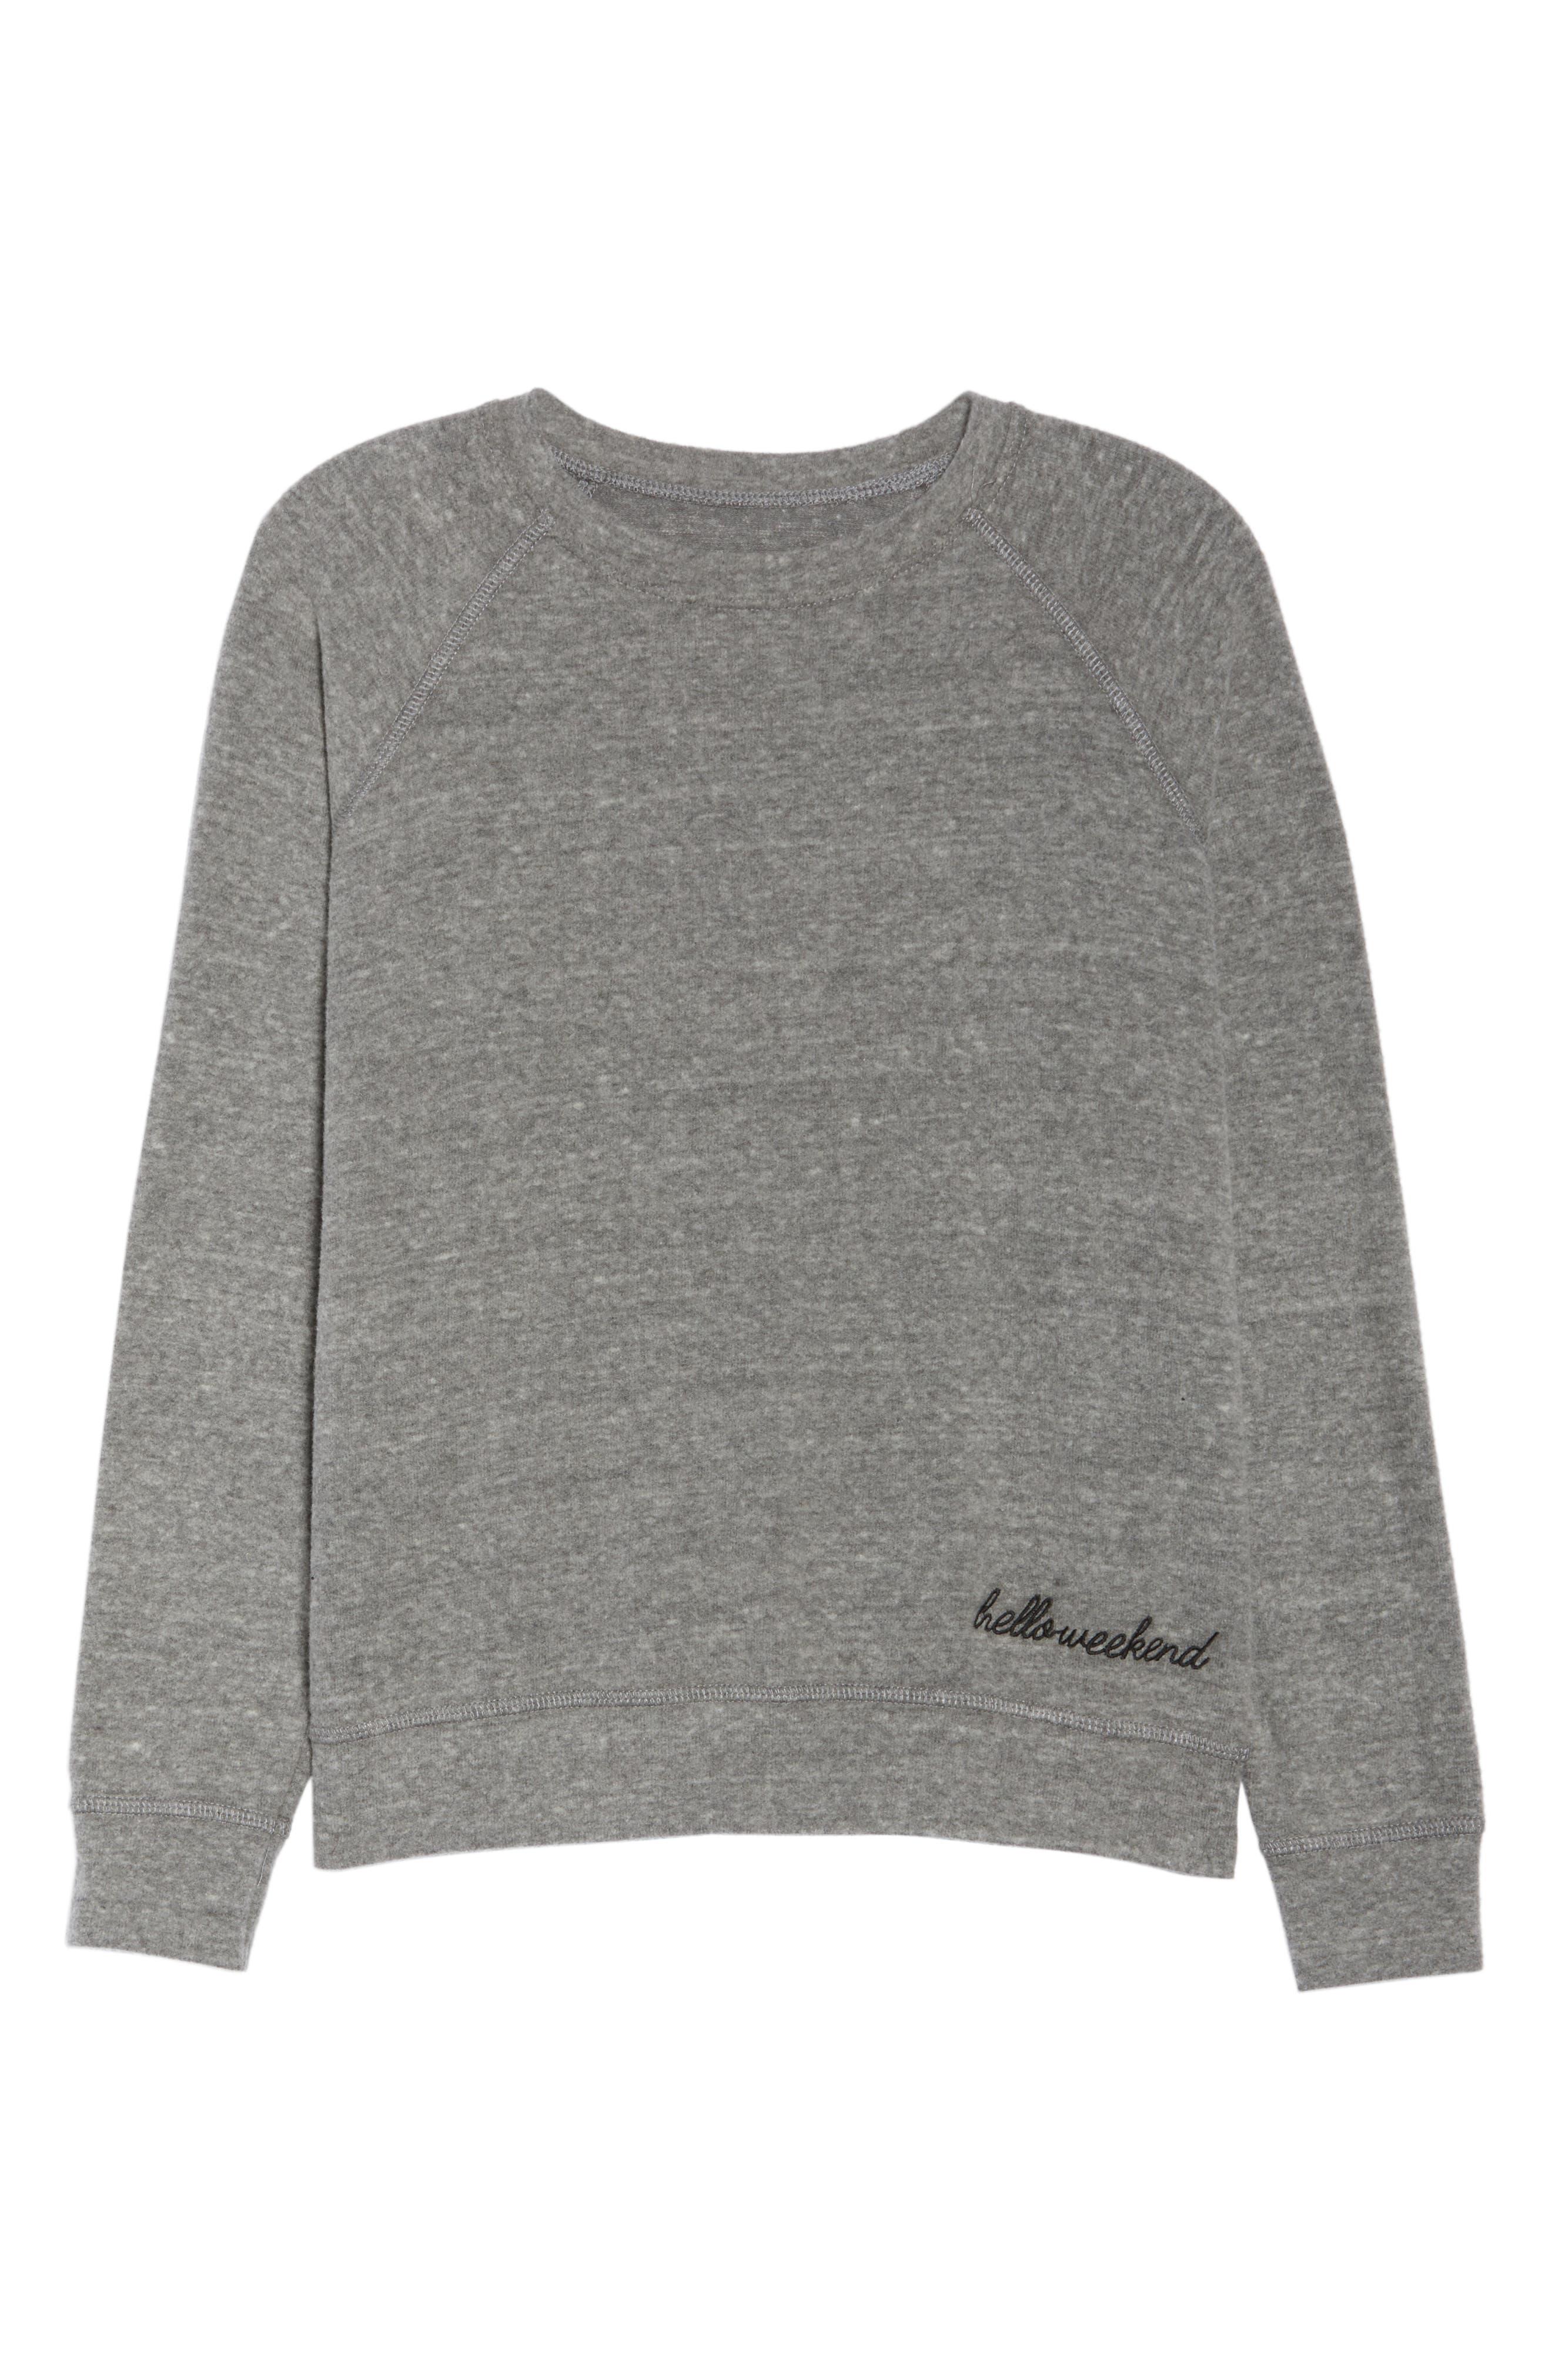 Roselynn Hello, Weekend Sweatshirt,                             Alternate thumbnail 7, color,                             020